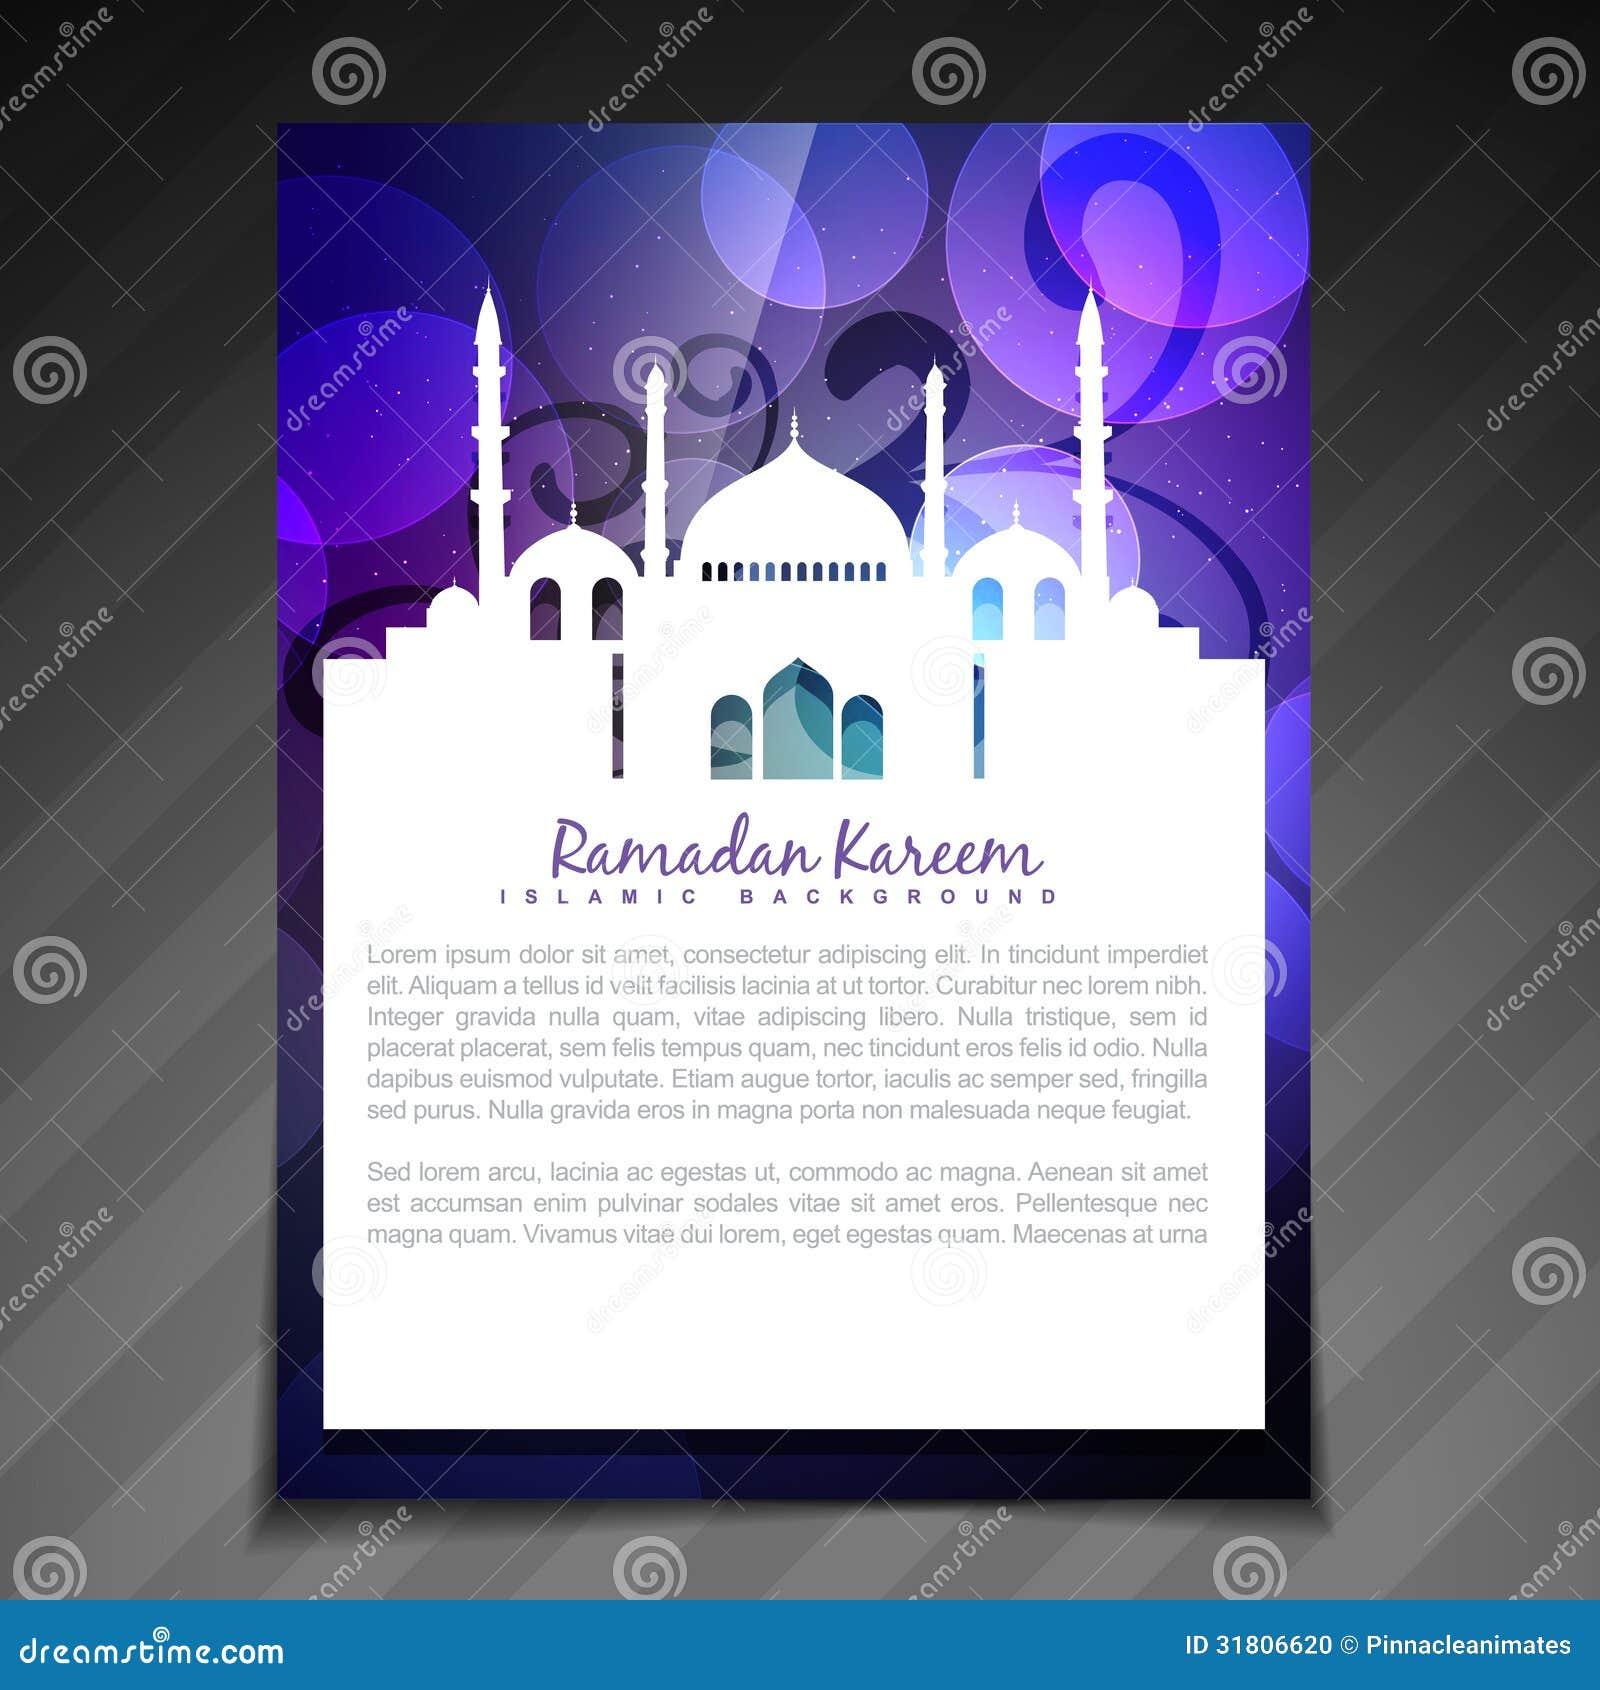 Ramadan brochure background stock vector image 31806620 for Islamic brochure design